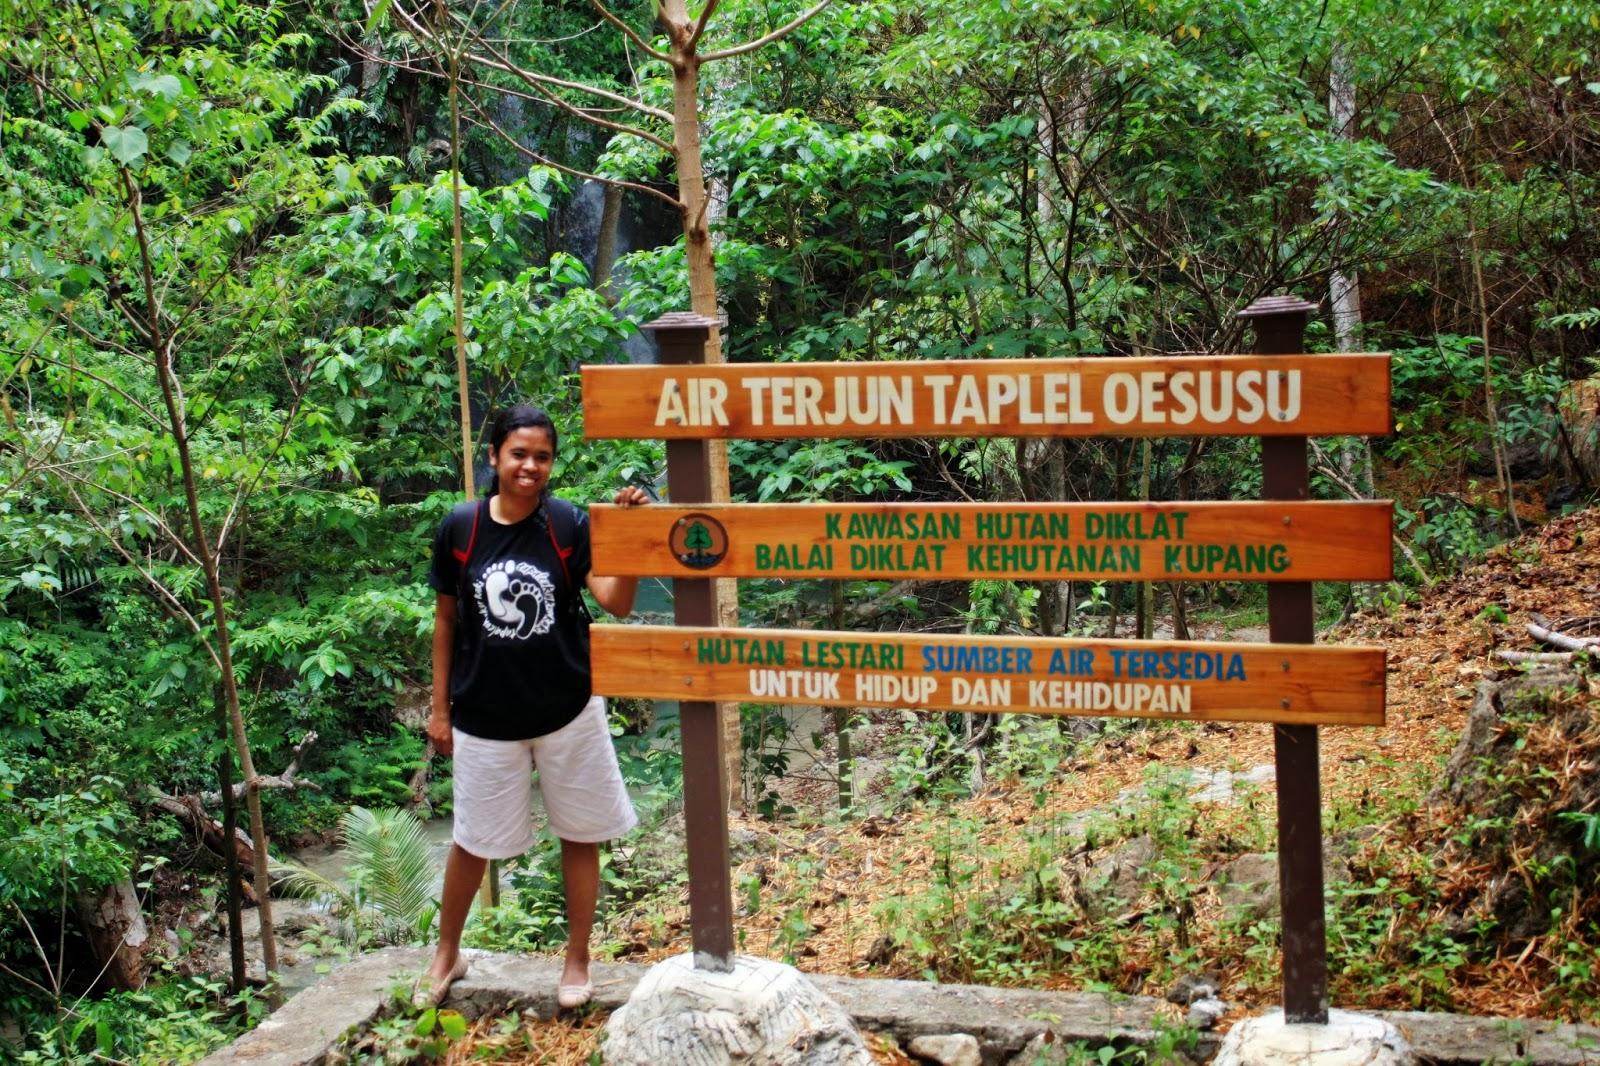 Inda Tapaleuk Air Terjun Taplel Oesusu Terletak Wilayah Camplong Kab